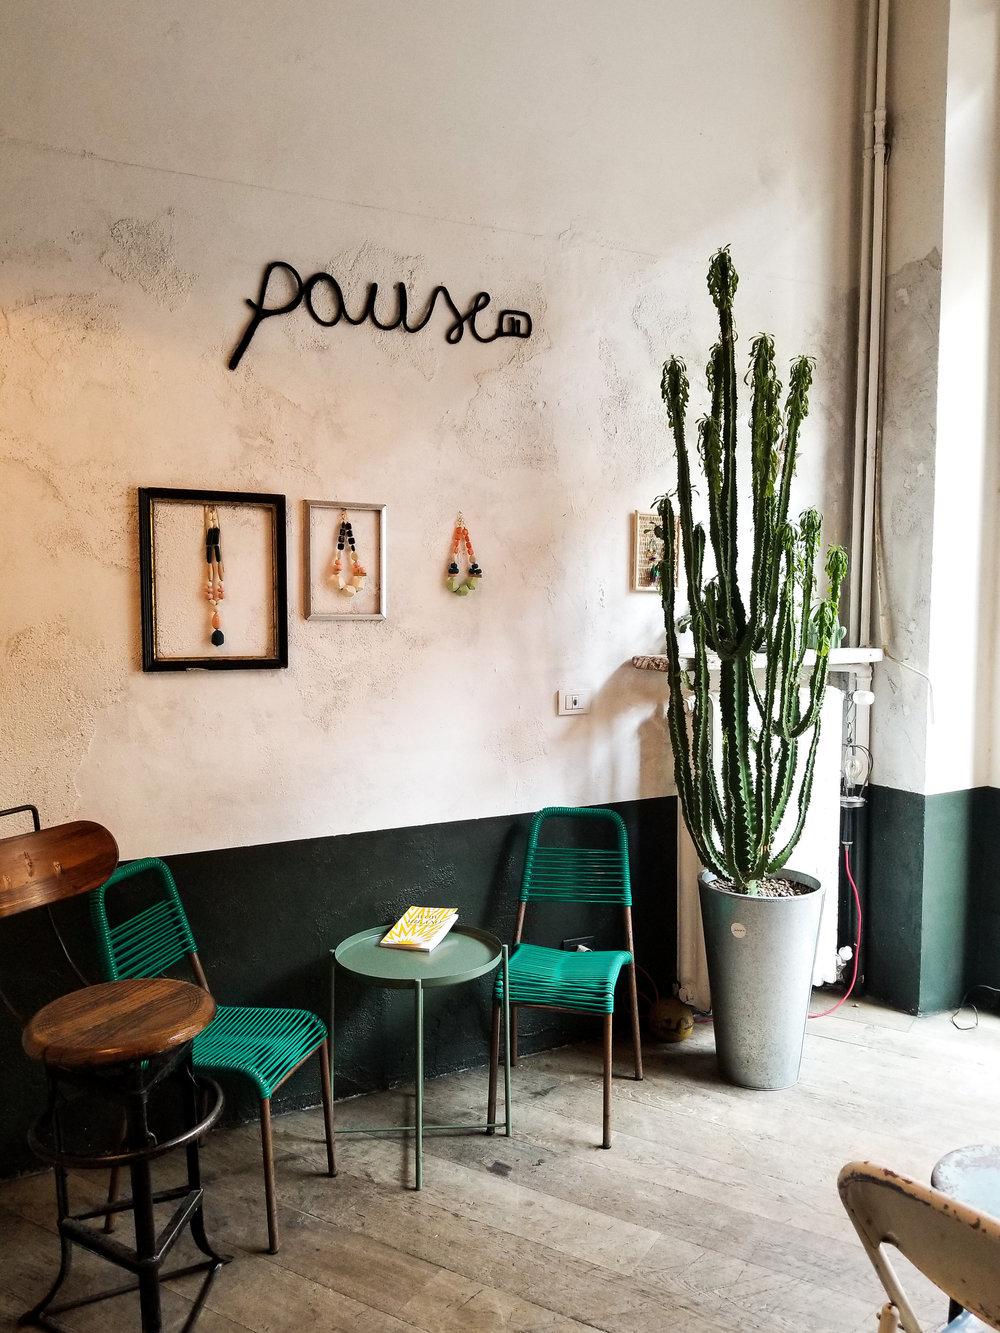 Atelier+Mave-Pause+cafe.jpg